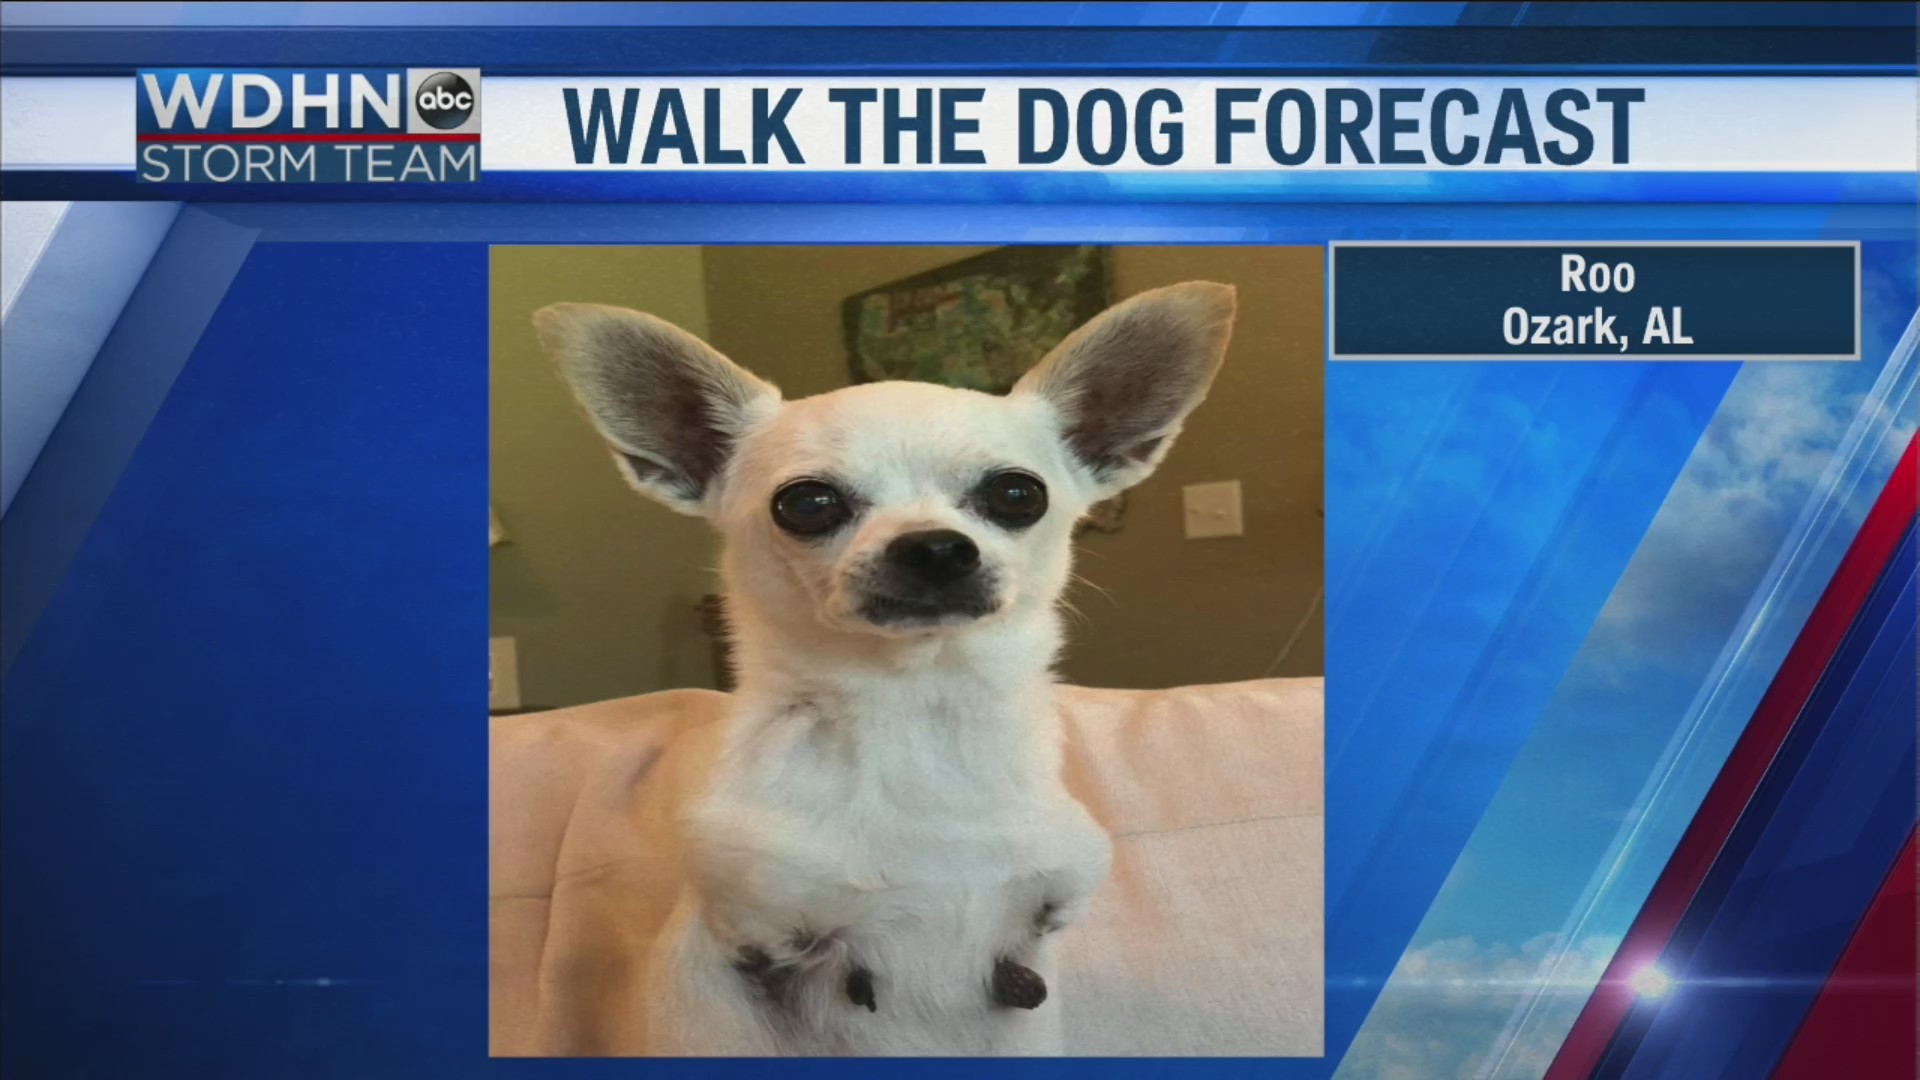 Walk the Dog Forecast Starring Roo